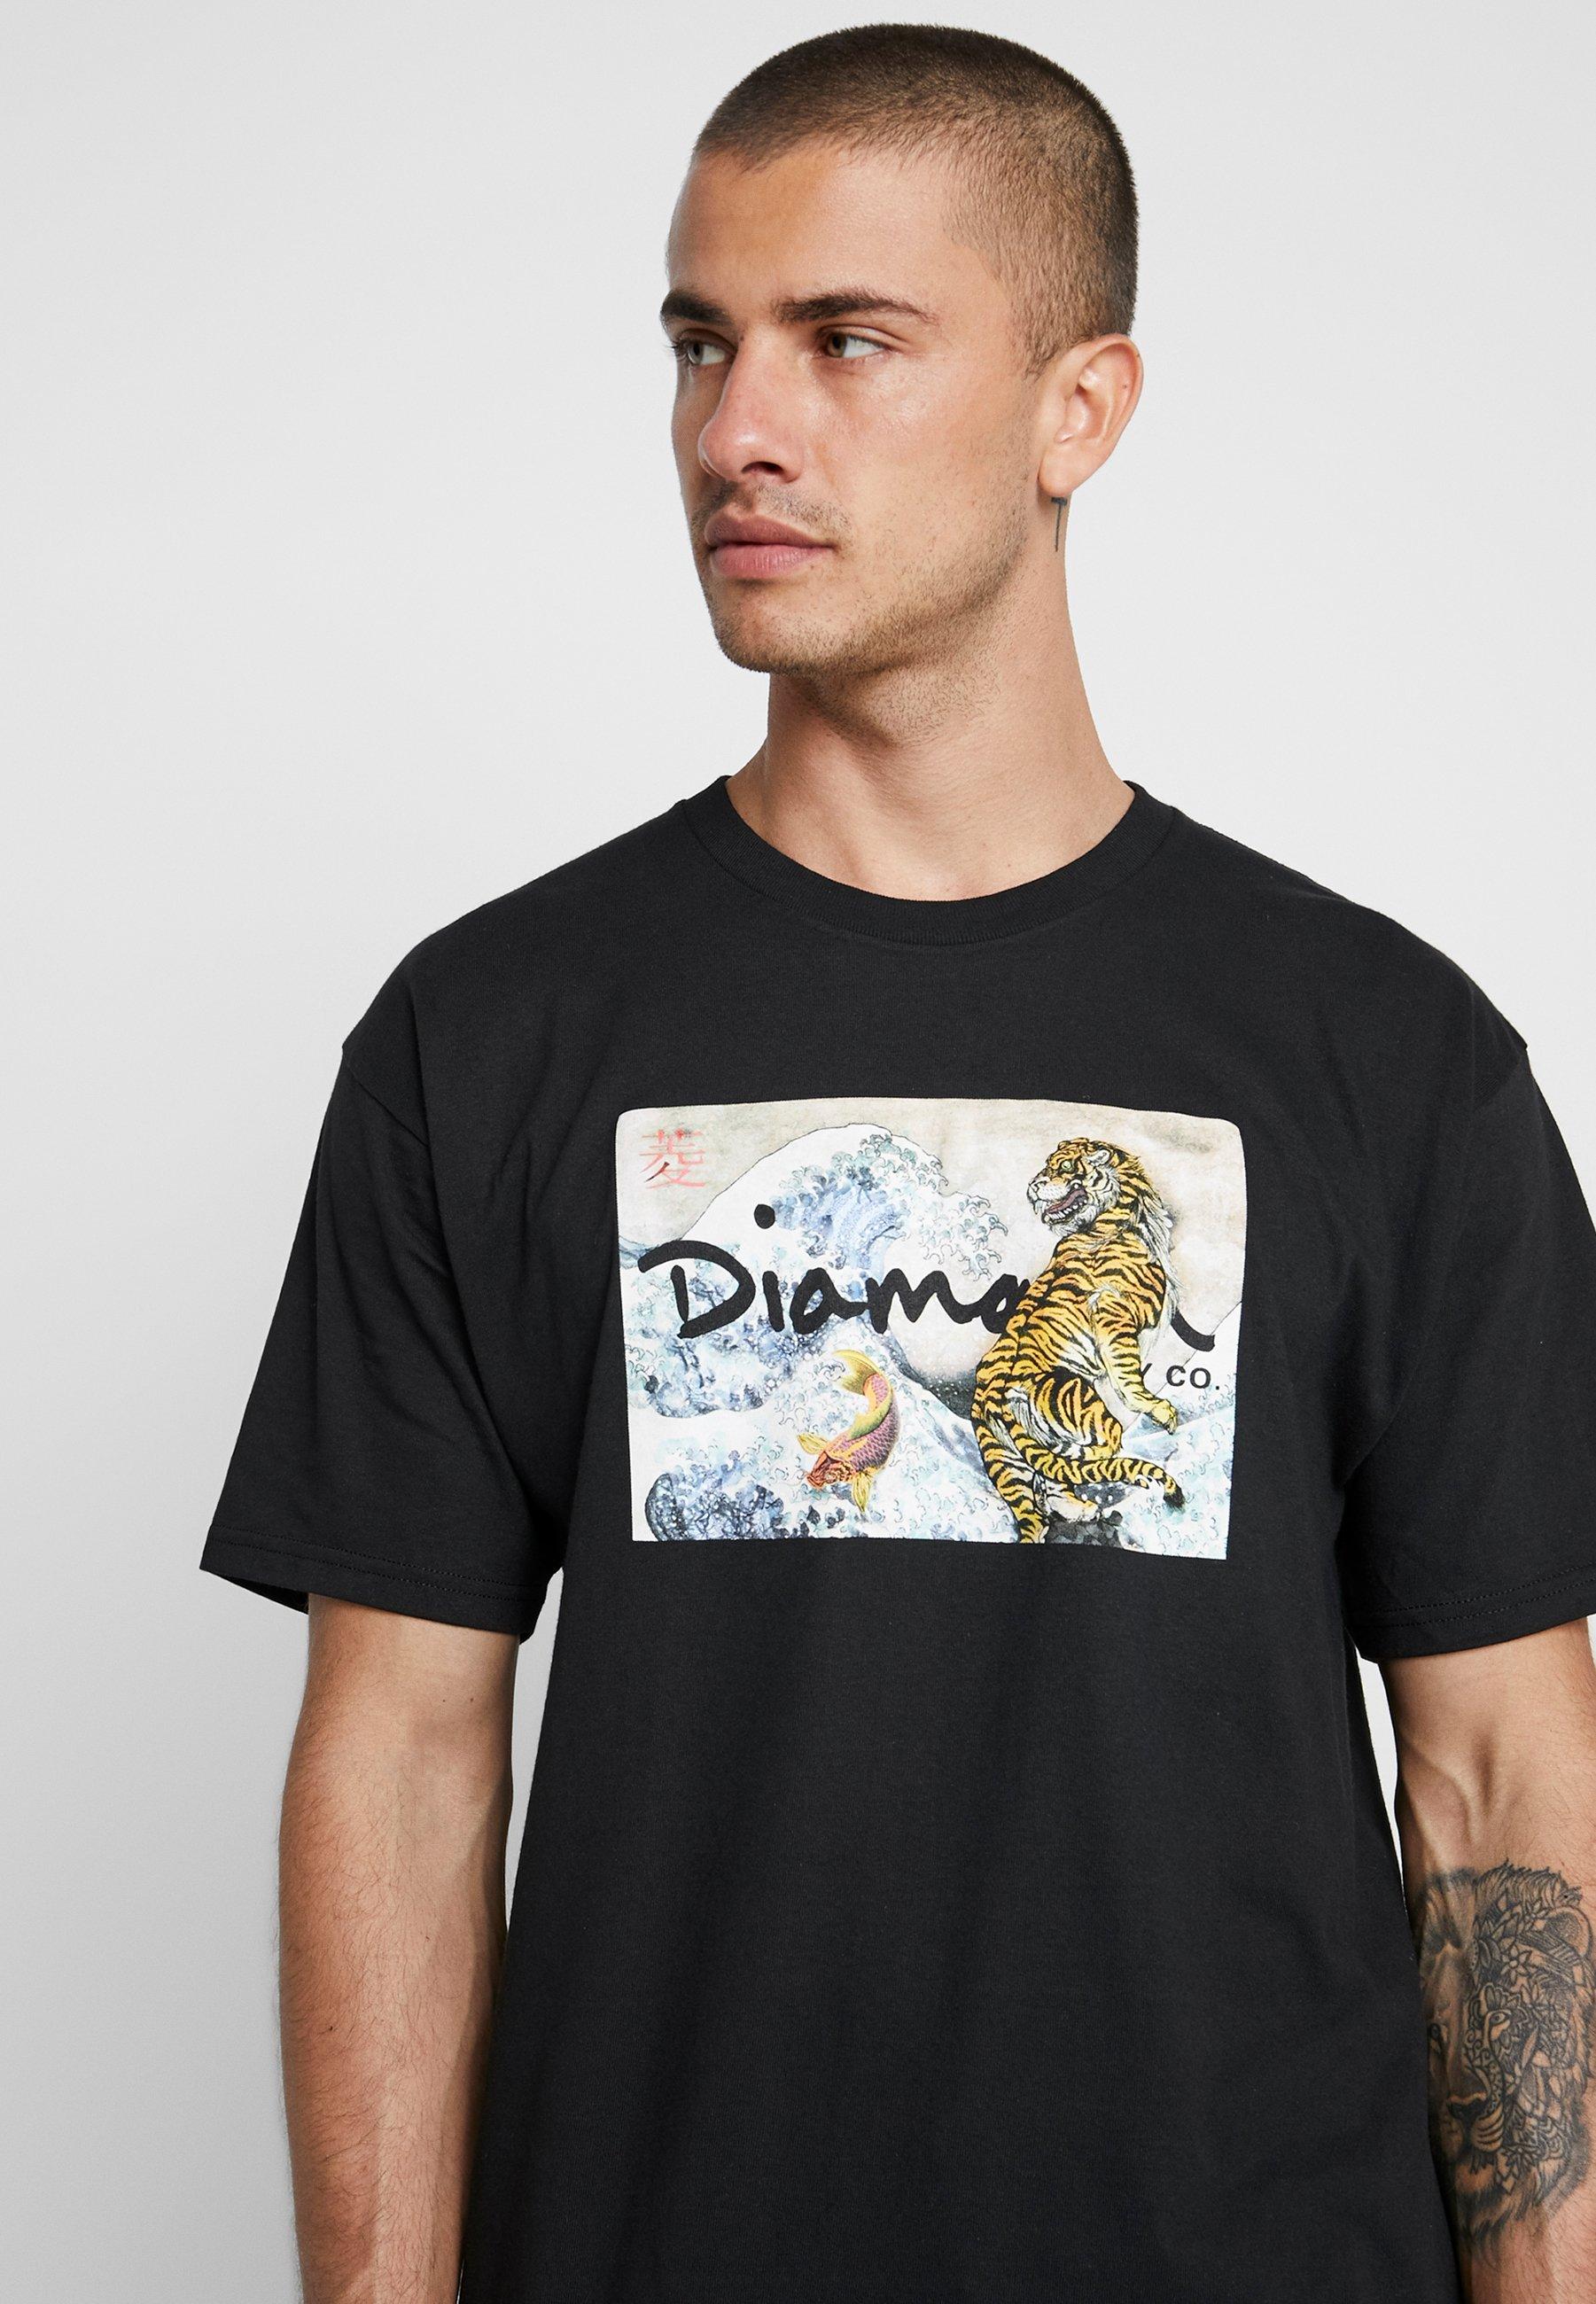 Diamond shirt Wave CoTiger TeeT Stampa Black Con Supply WDHIbe9E2Y